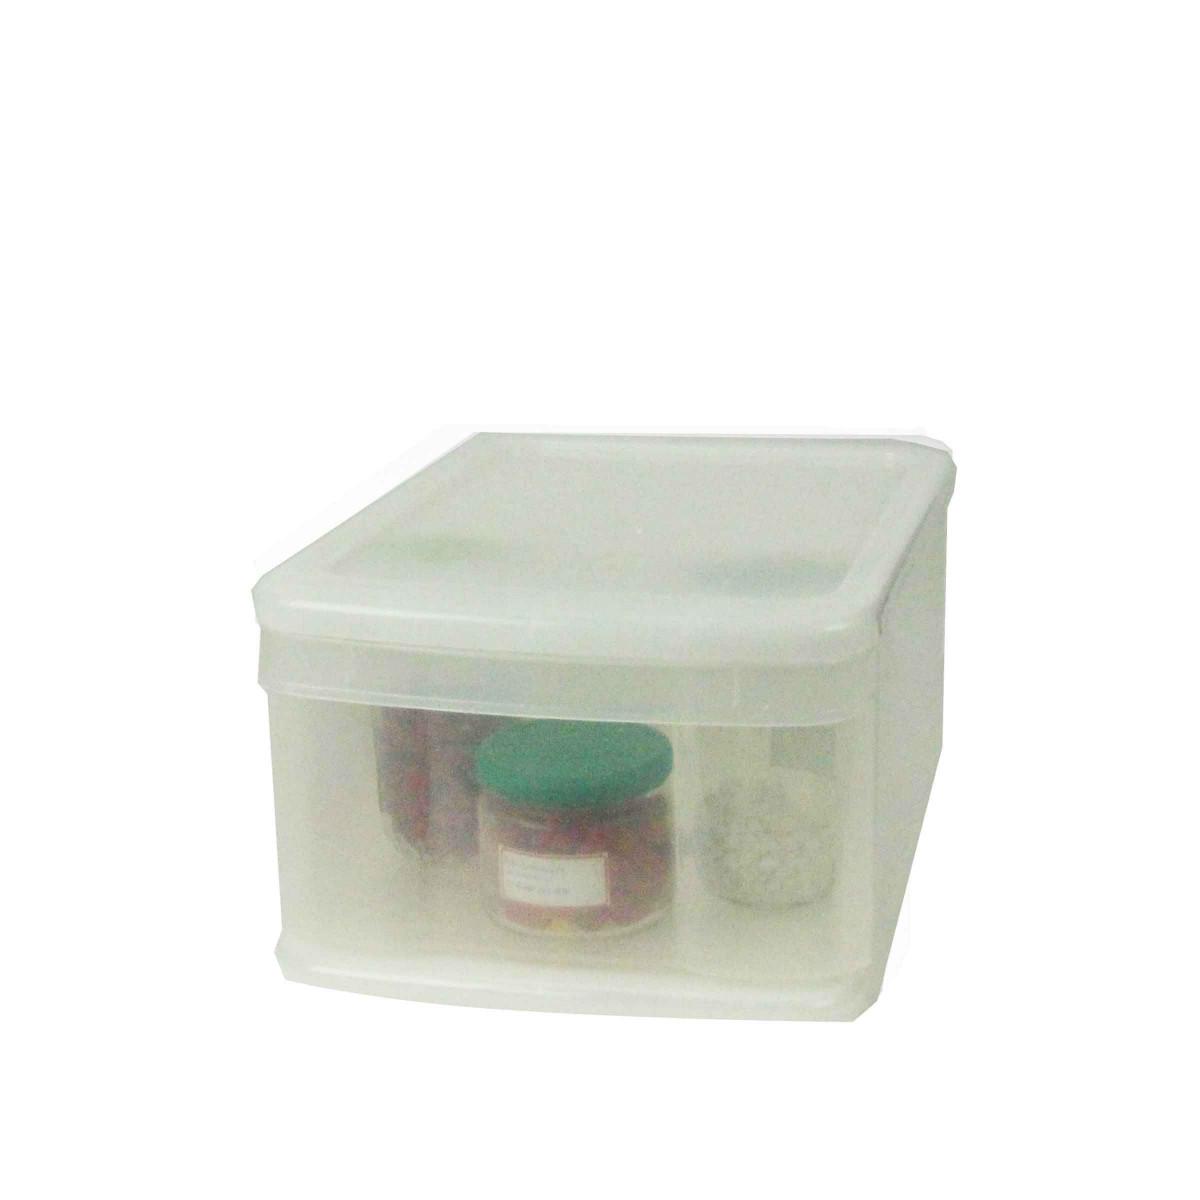 boite plastique cheap boite plastique banche ml xxmm with. Black Bedroom Furniture Sets. Home Design Ideas